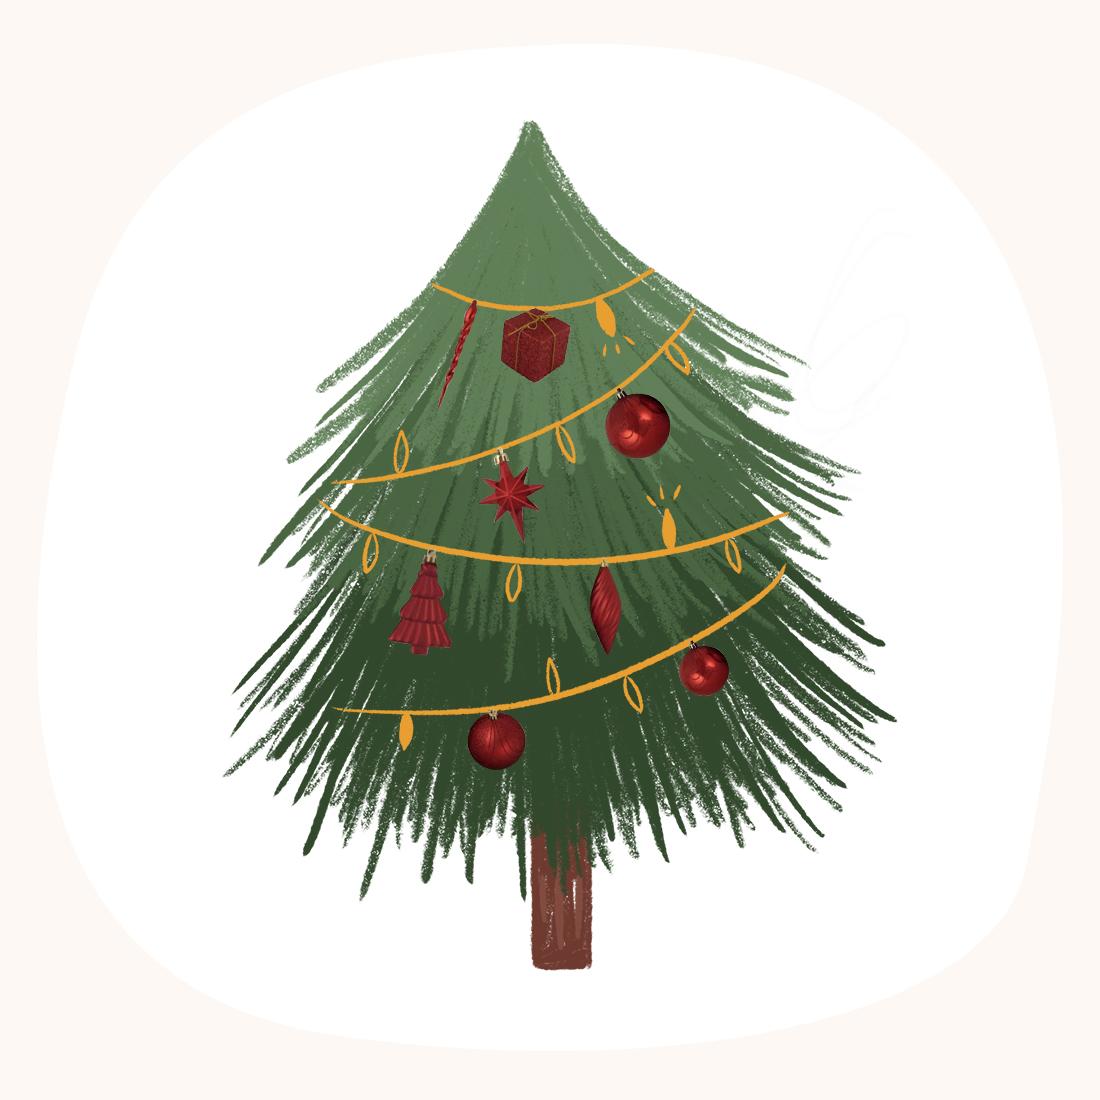 Kohls-Holiday-2018_Custom-Designed-Article_10.jpg